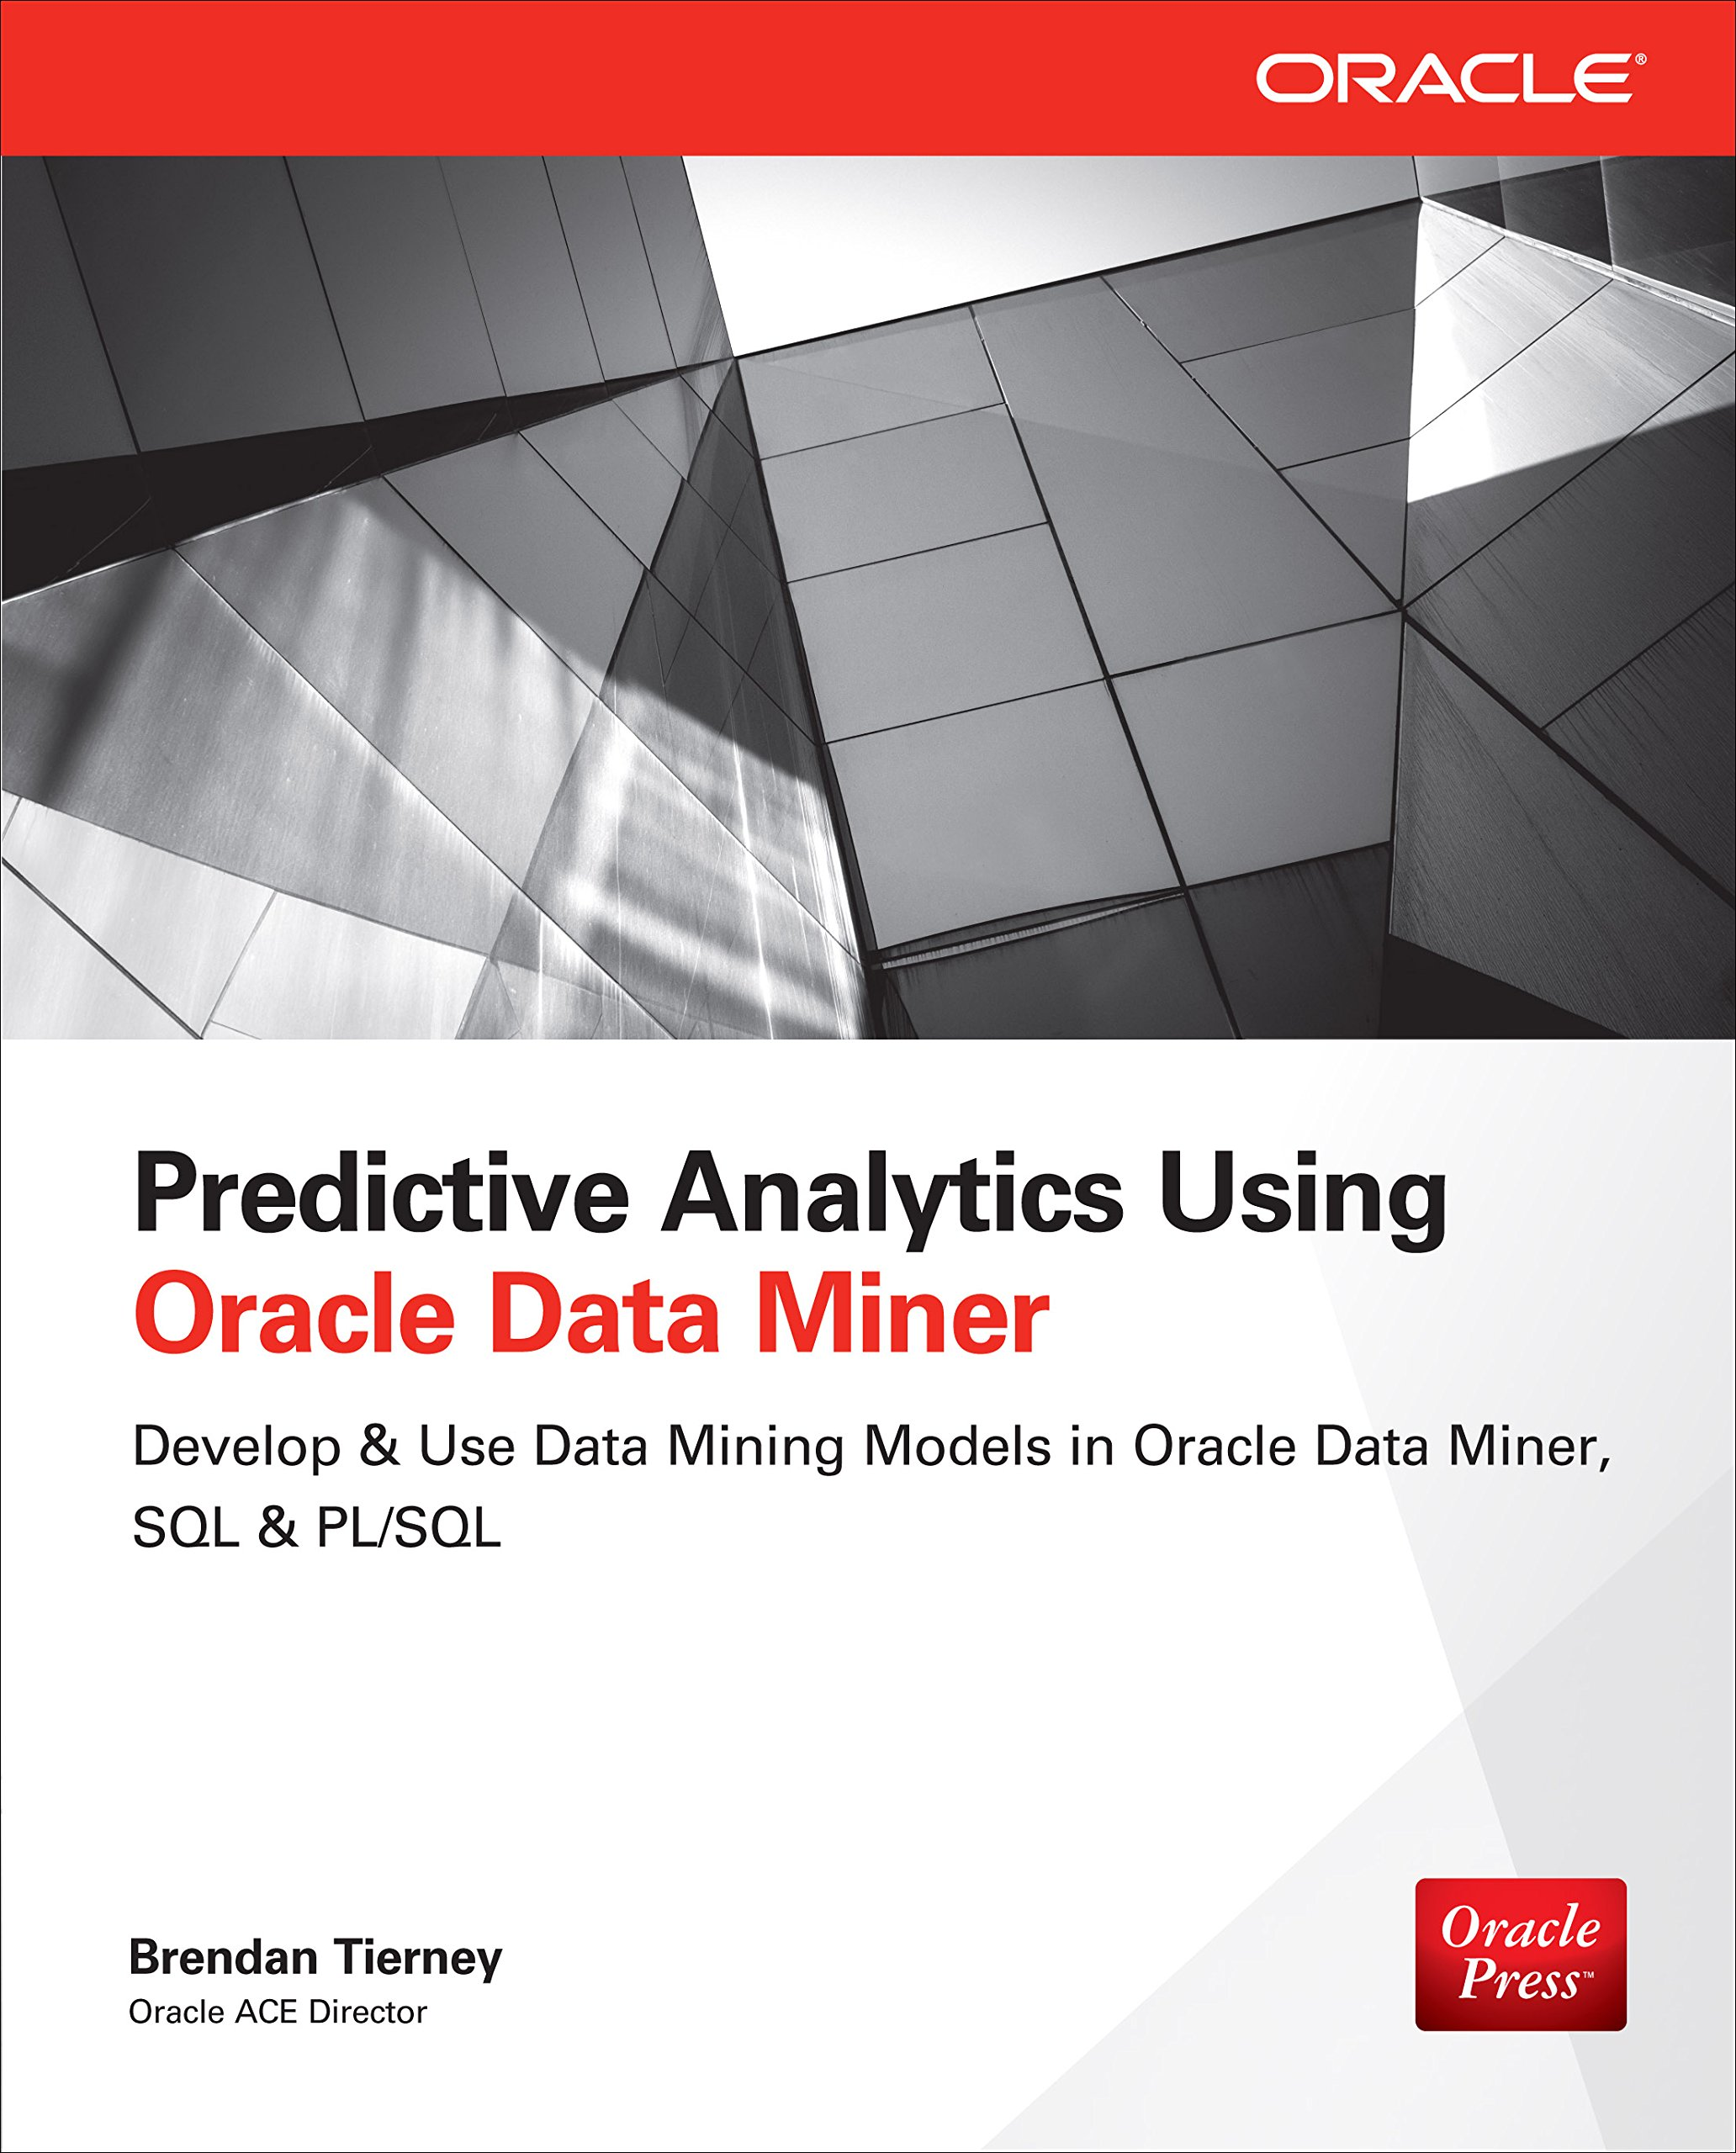 Predictive Analytics Using Oracle Data Miner: Develop & Use Data Mining Models in ODM, SQL & PL/SQL